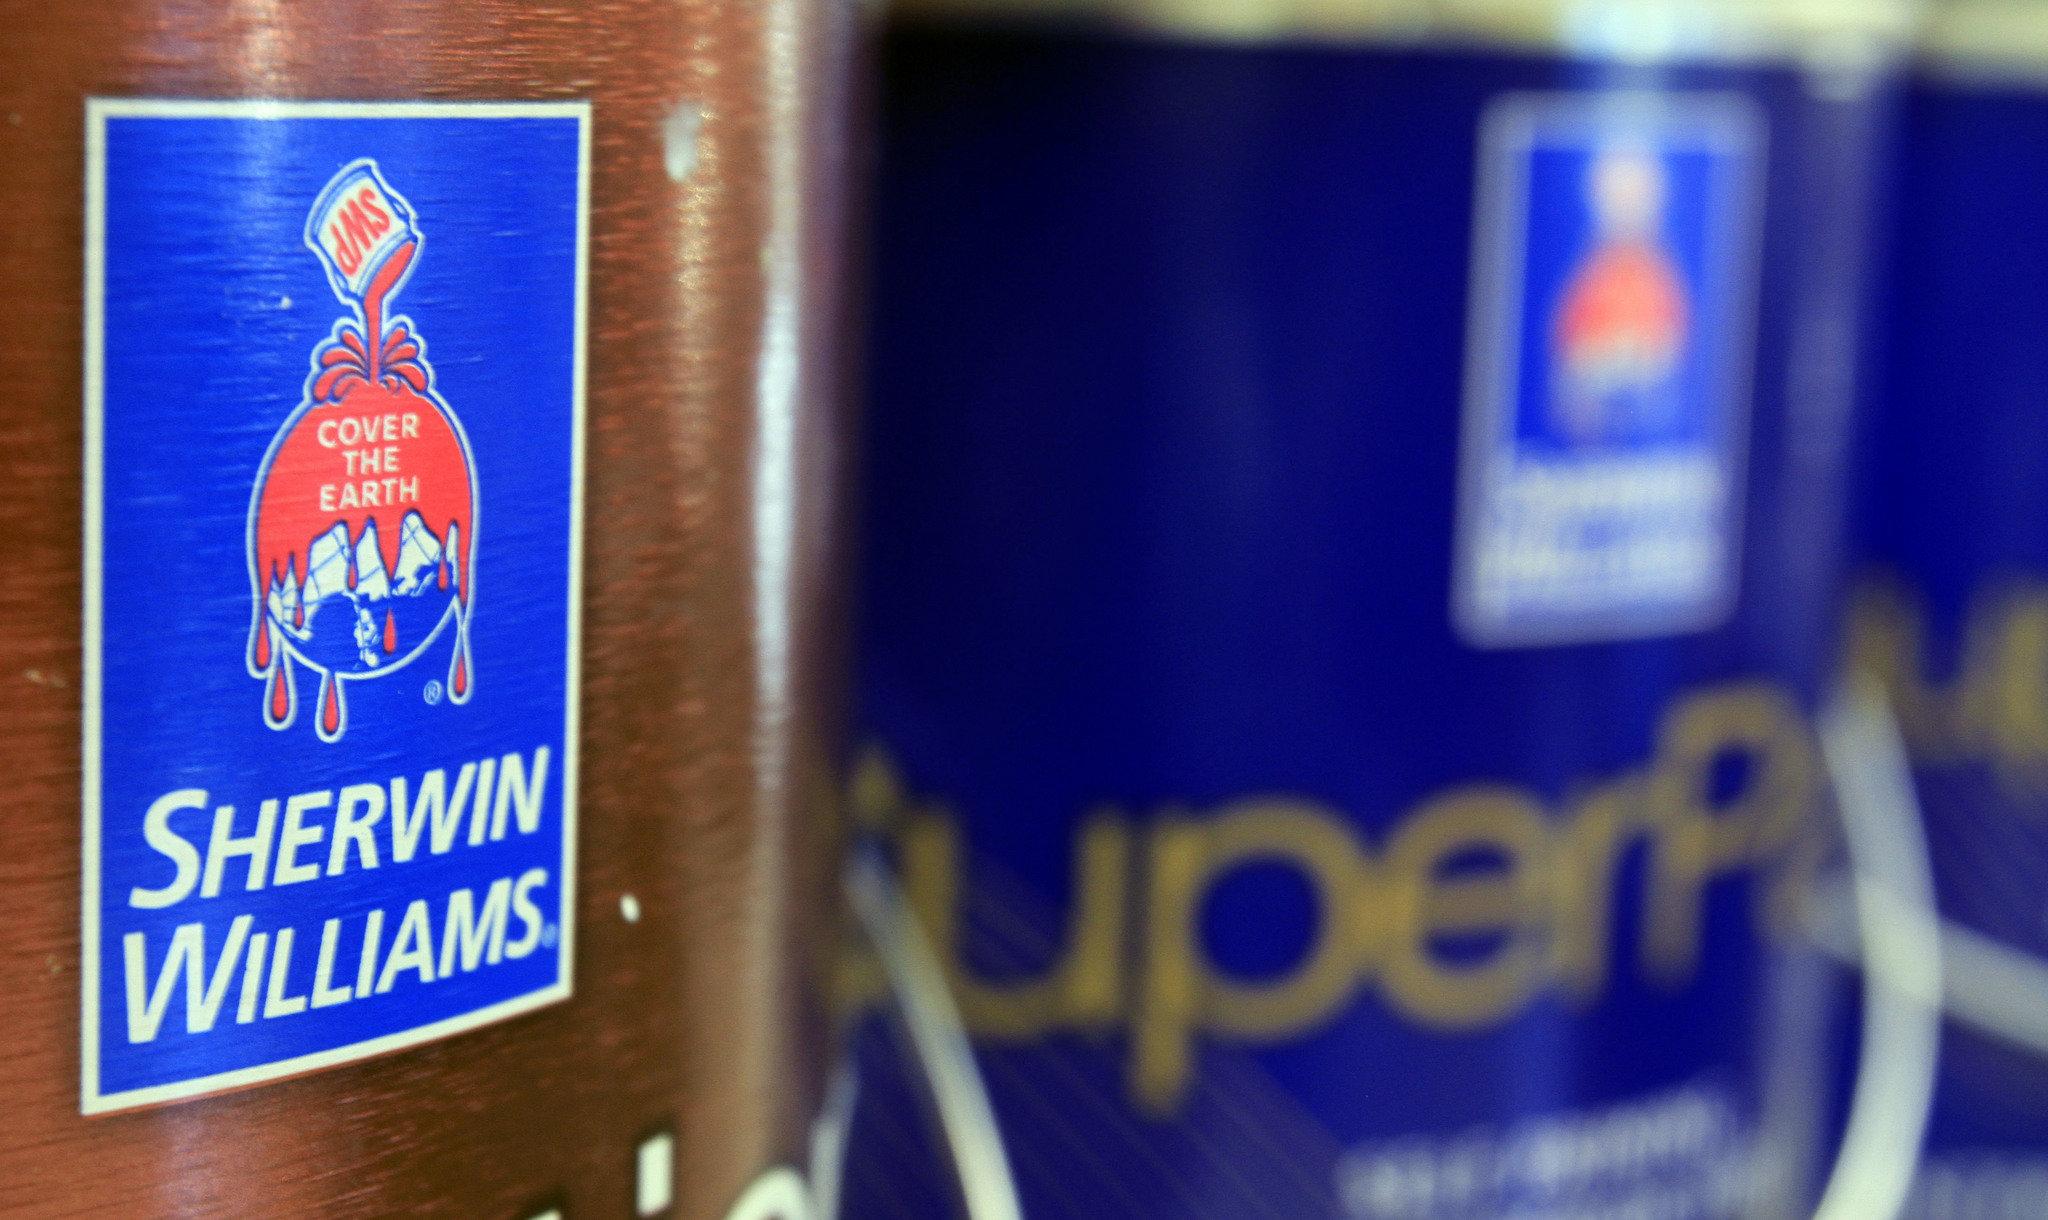 sherwin williams buying rival valspar paints and coatings in 11 3 sherwin williams buying rival valspar paints and coatings in 11 3 billion deal syracuse com